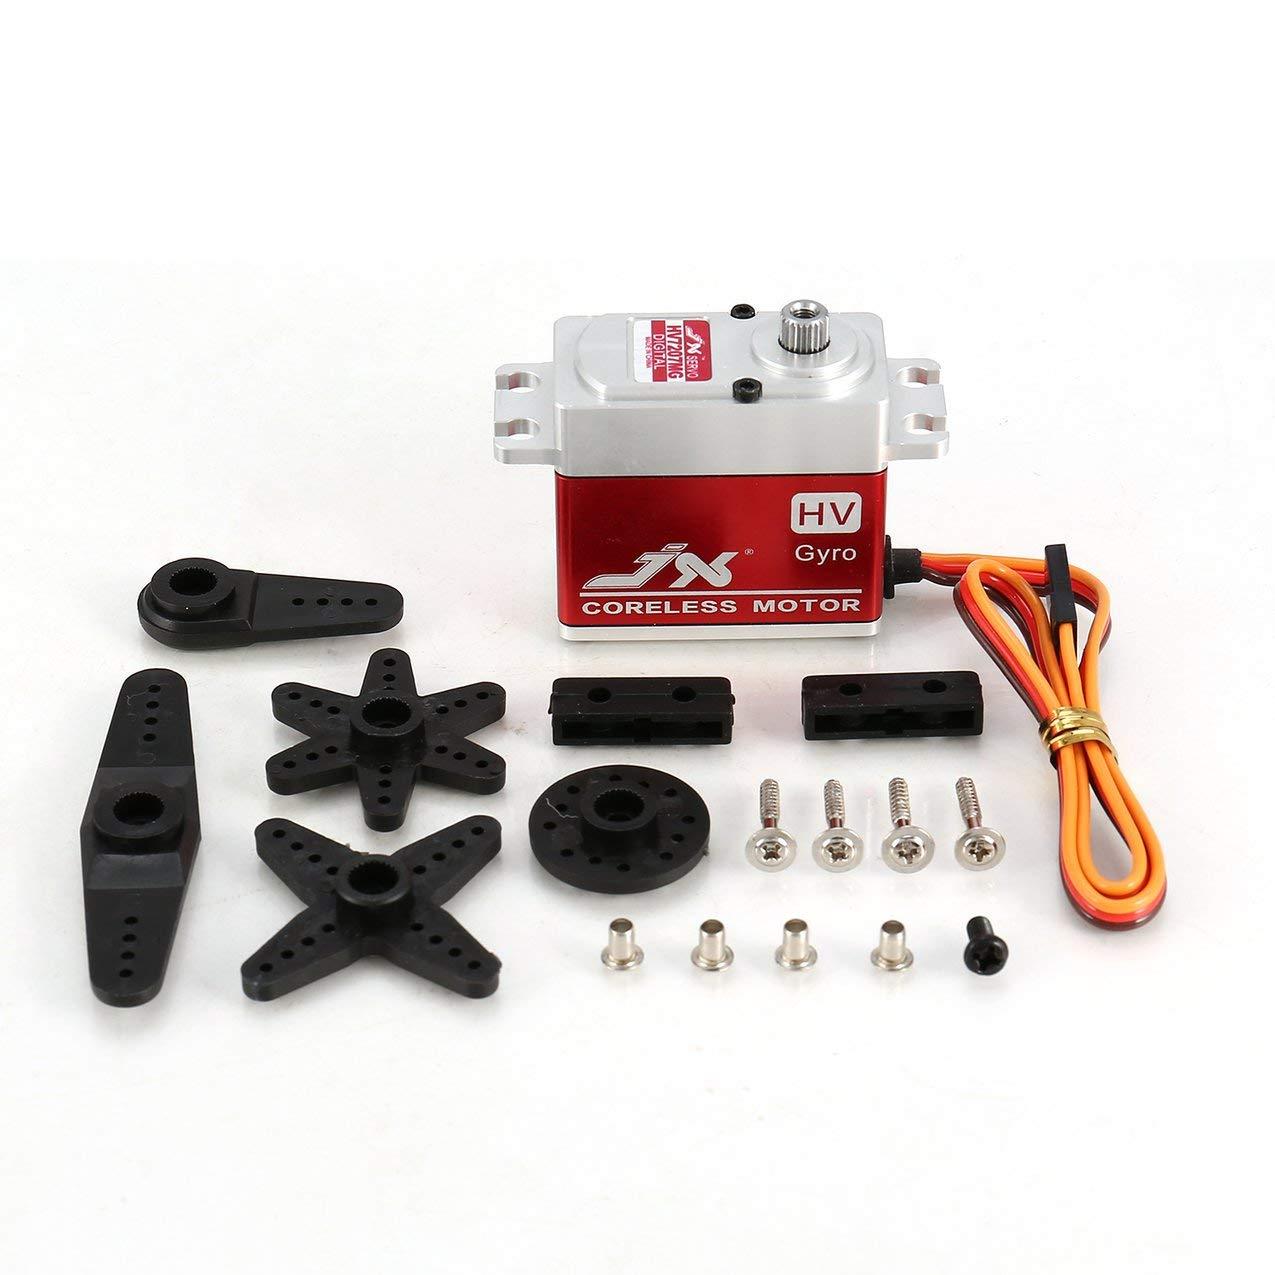 ROTstrong JX PDI-HV7207MG 7KG CNC Lenkung Digital Metallgetriebe HV Coreless Servo RC Auto